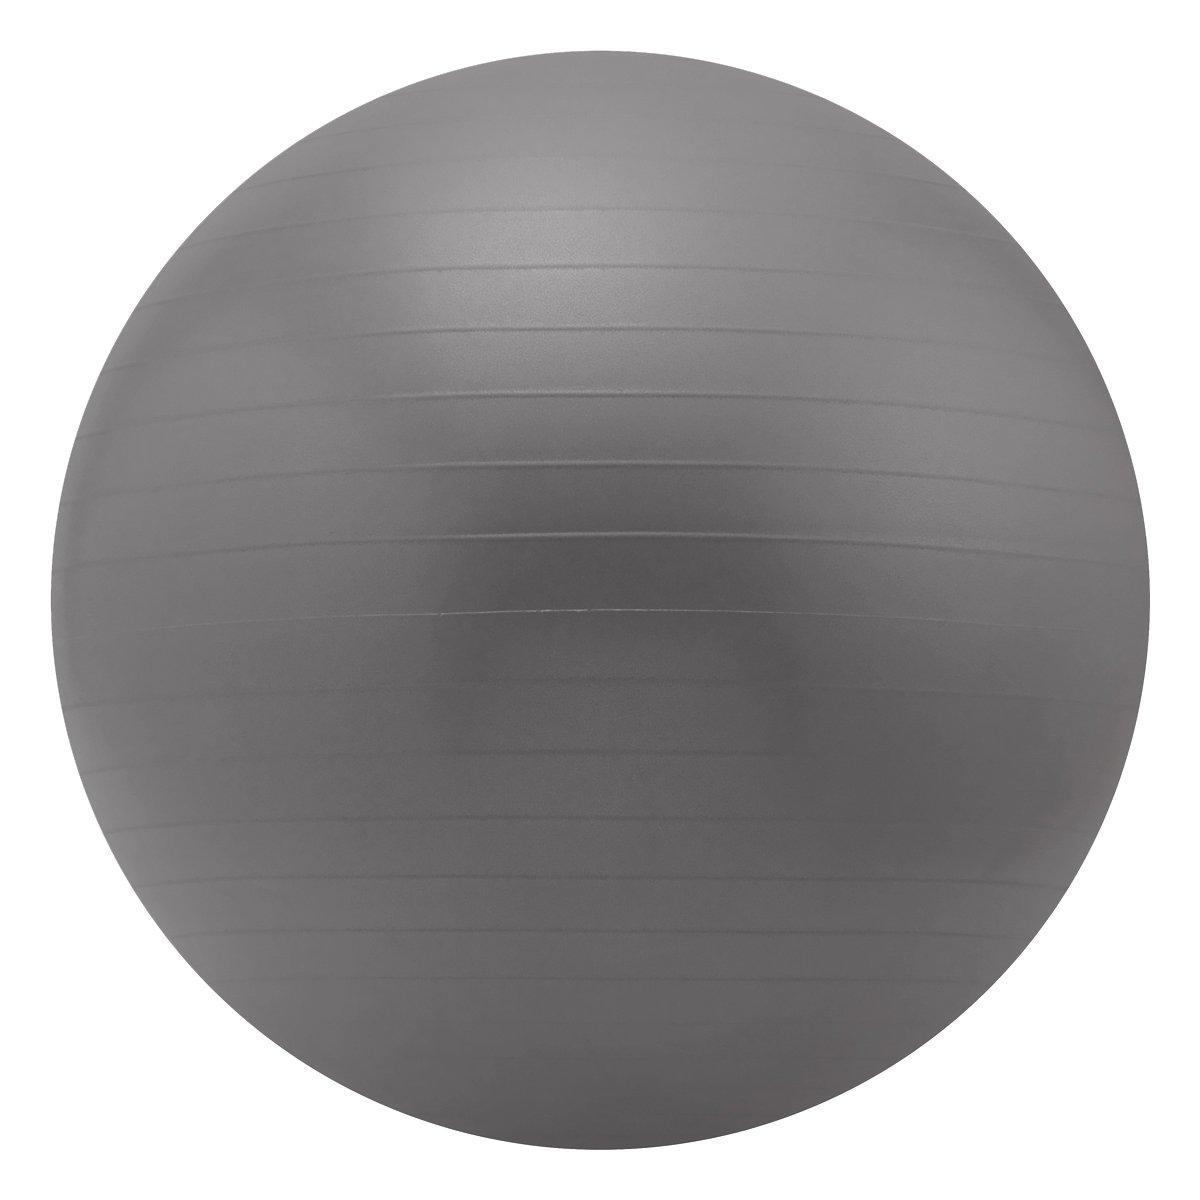 Sivan Health & Fitness Yoga Stability Ball and Pump, Grey, 75cm